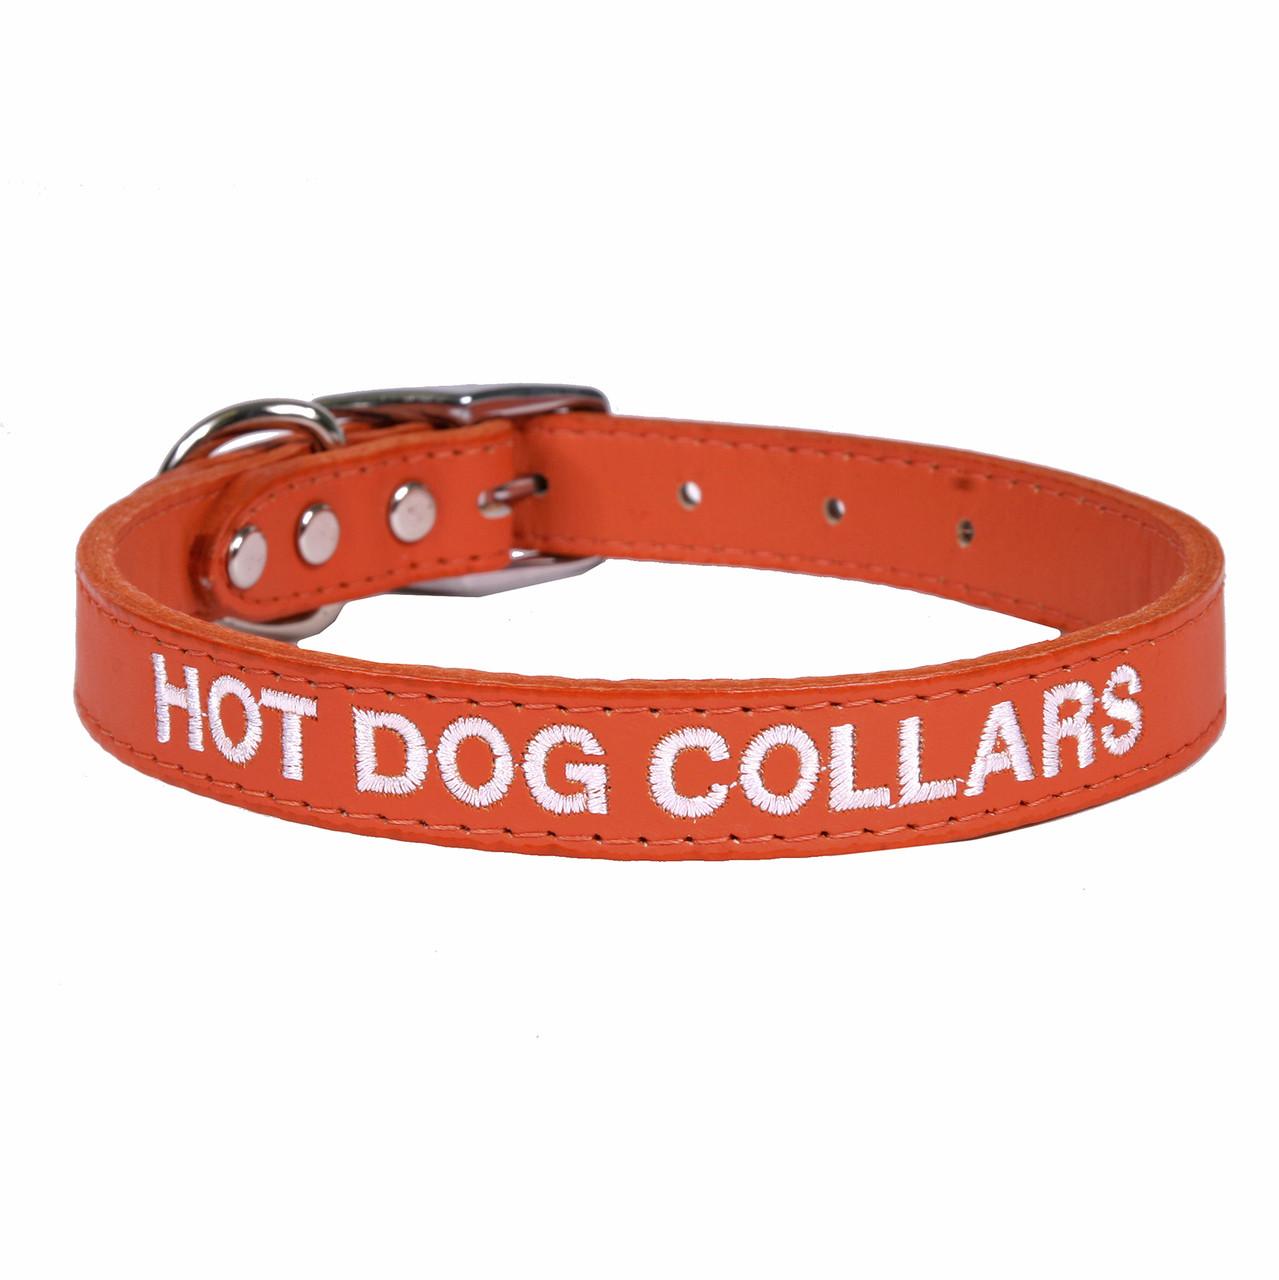 Designer Dog Collar Personalized Leather Dog Collar Luxury Dog Collar Personalized Leather Dog Collar Personalized in Horween Leathers